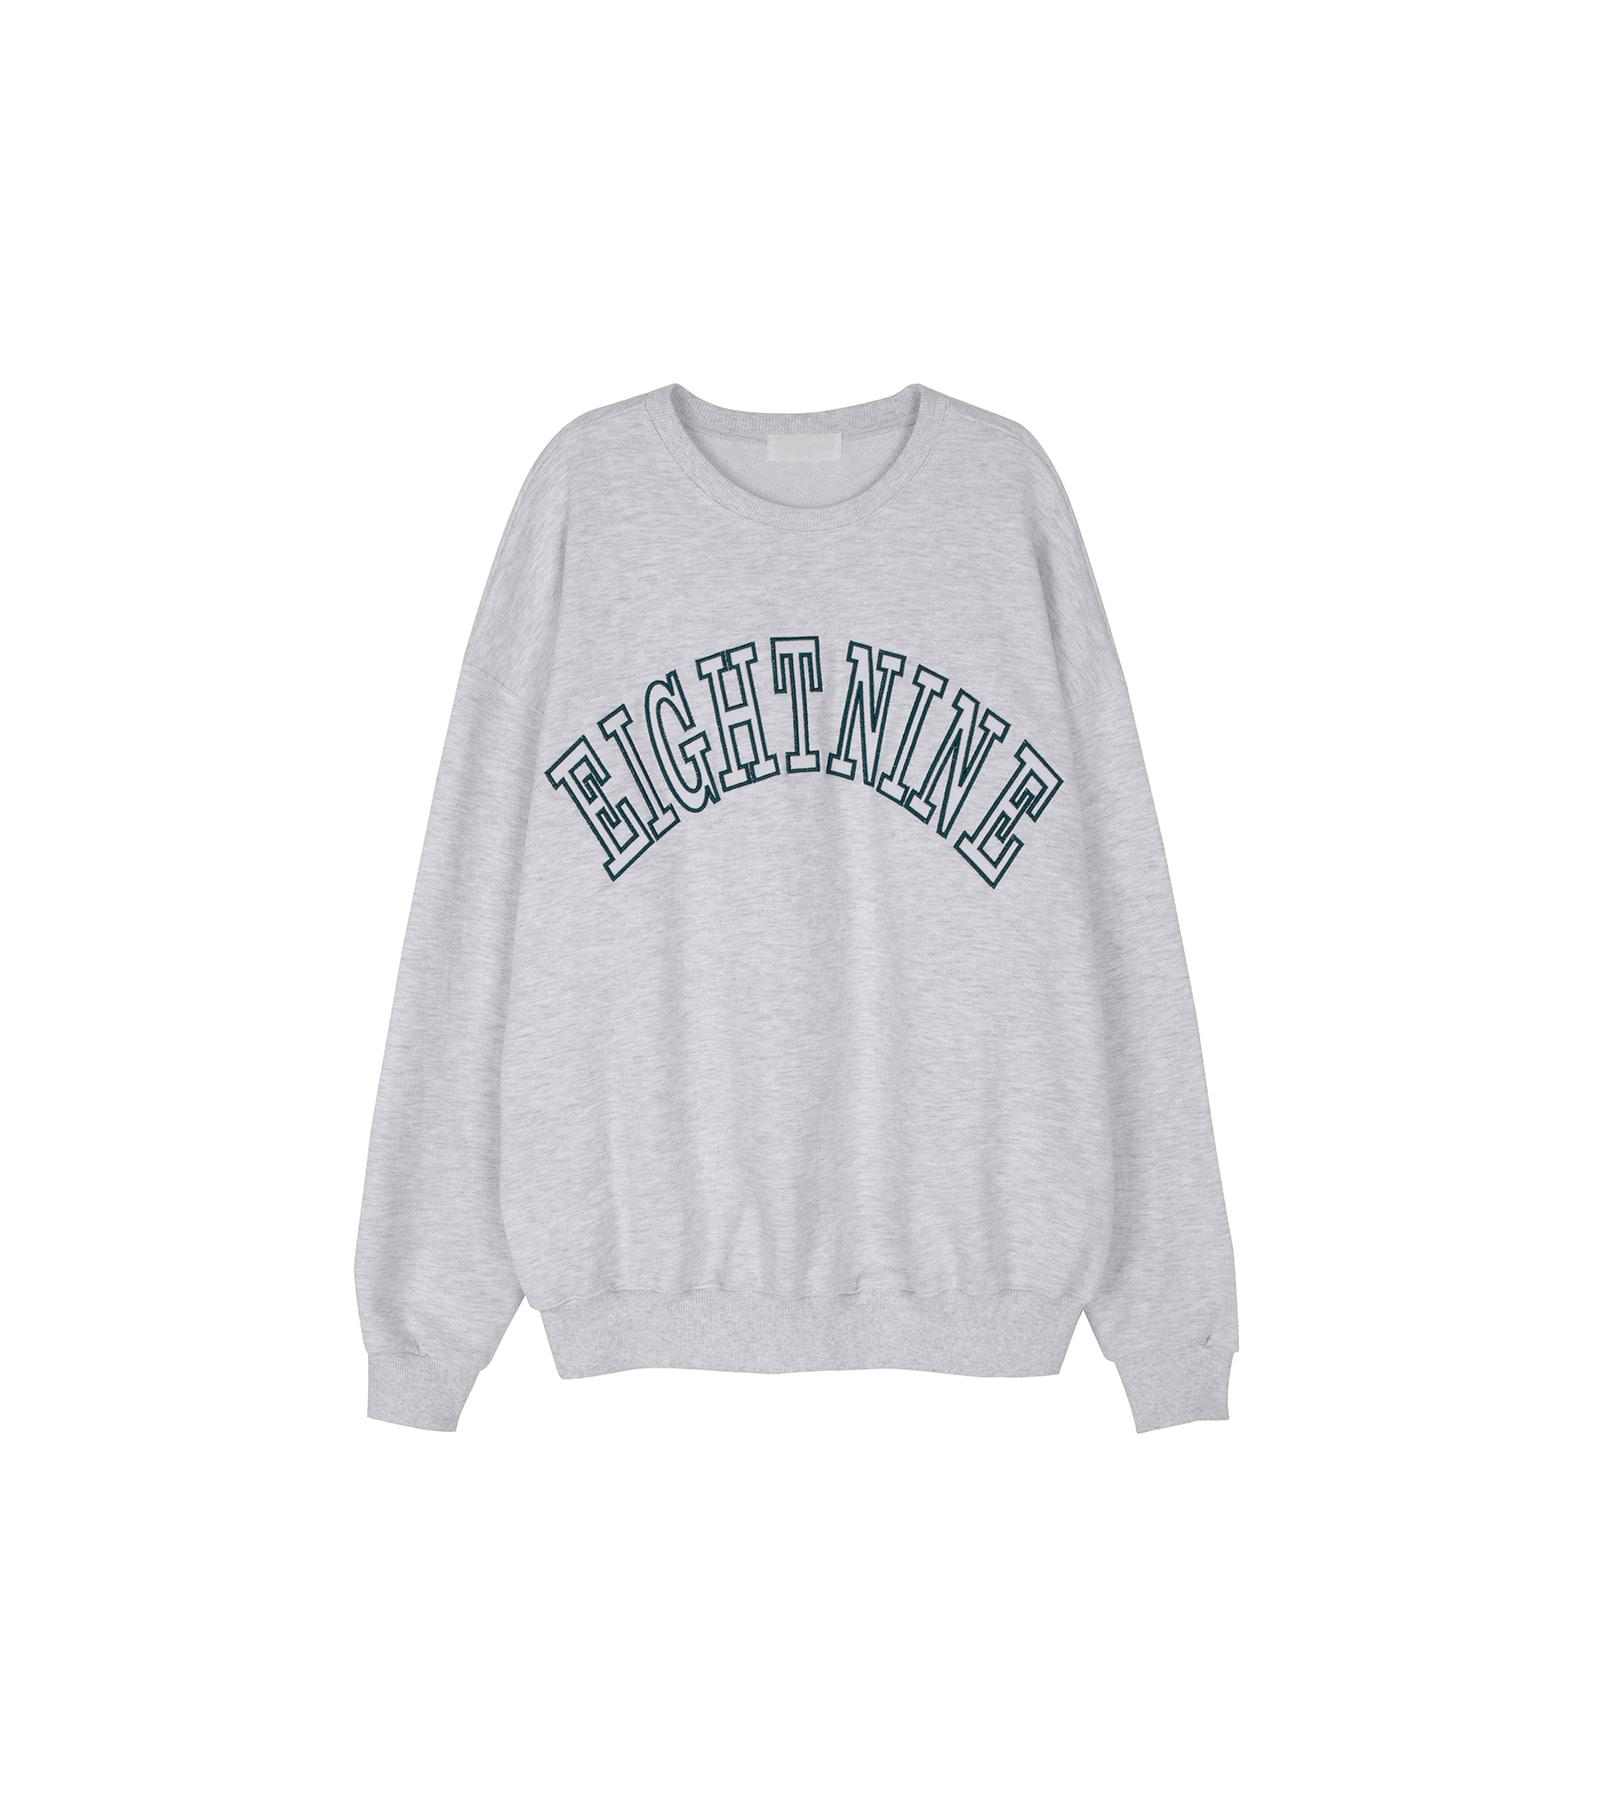 Nine overfit sweatshirt